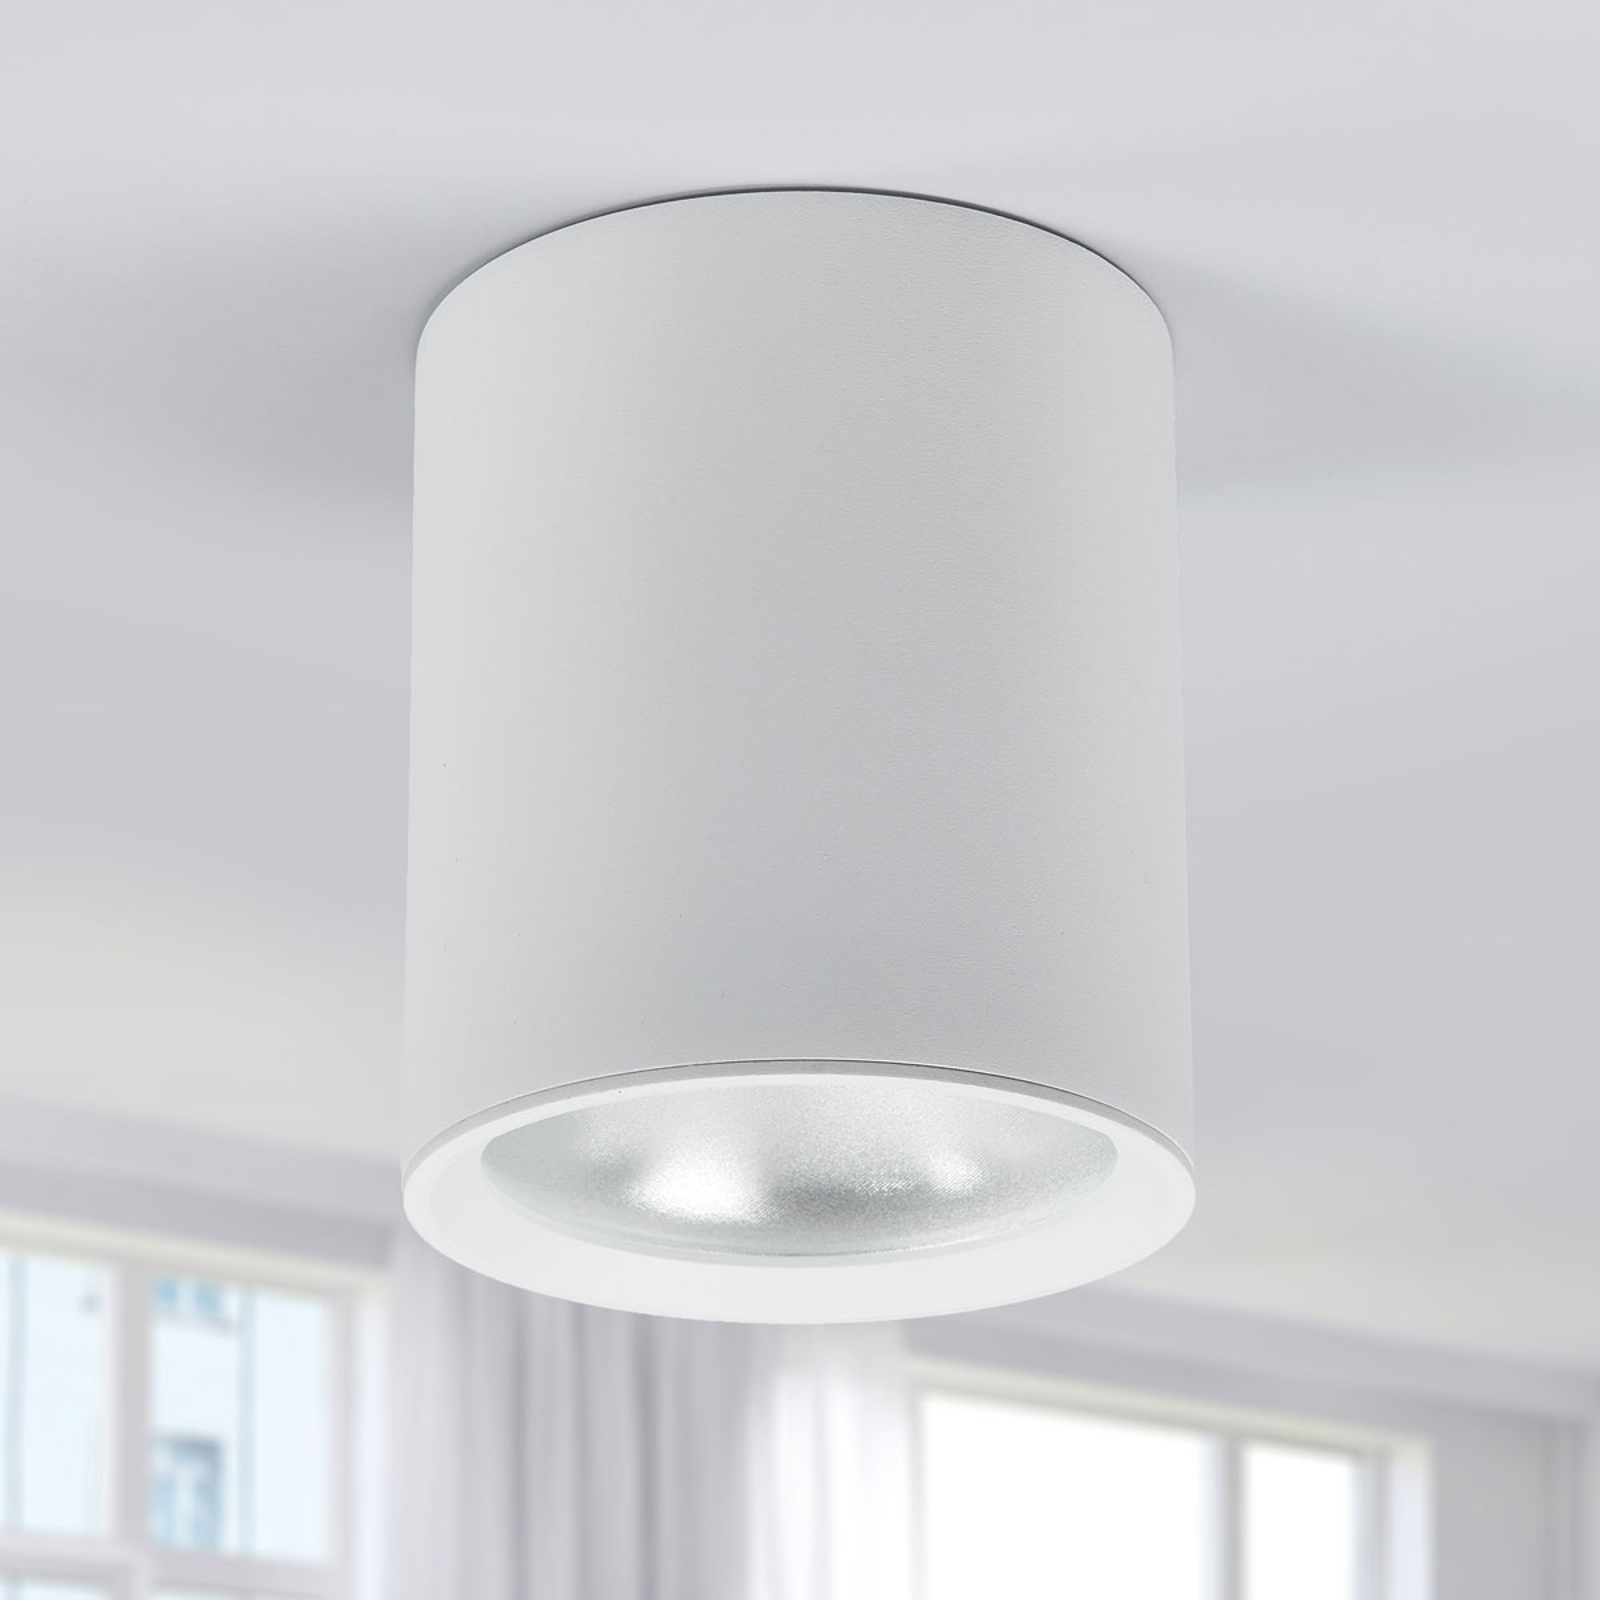 Plafonnier LED Benk, 13cm, 12,3W